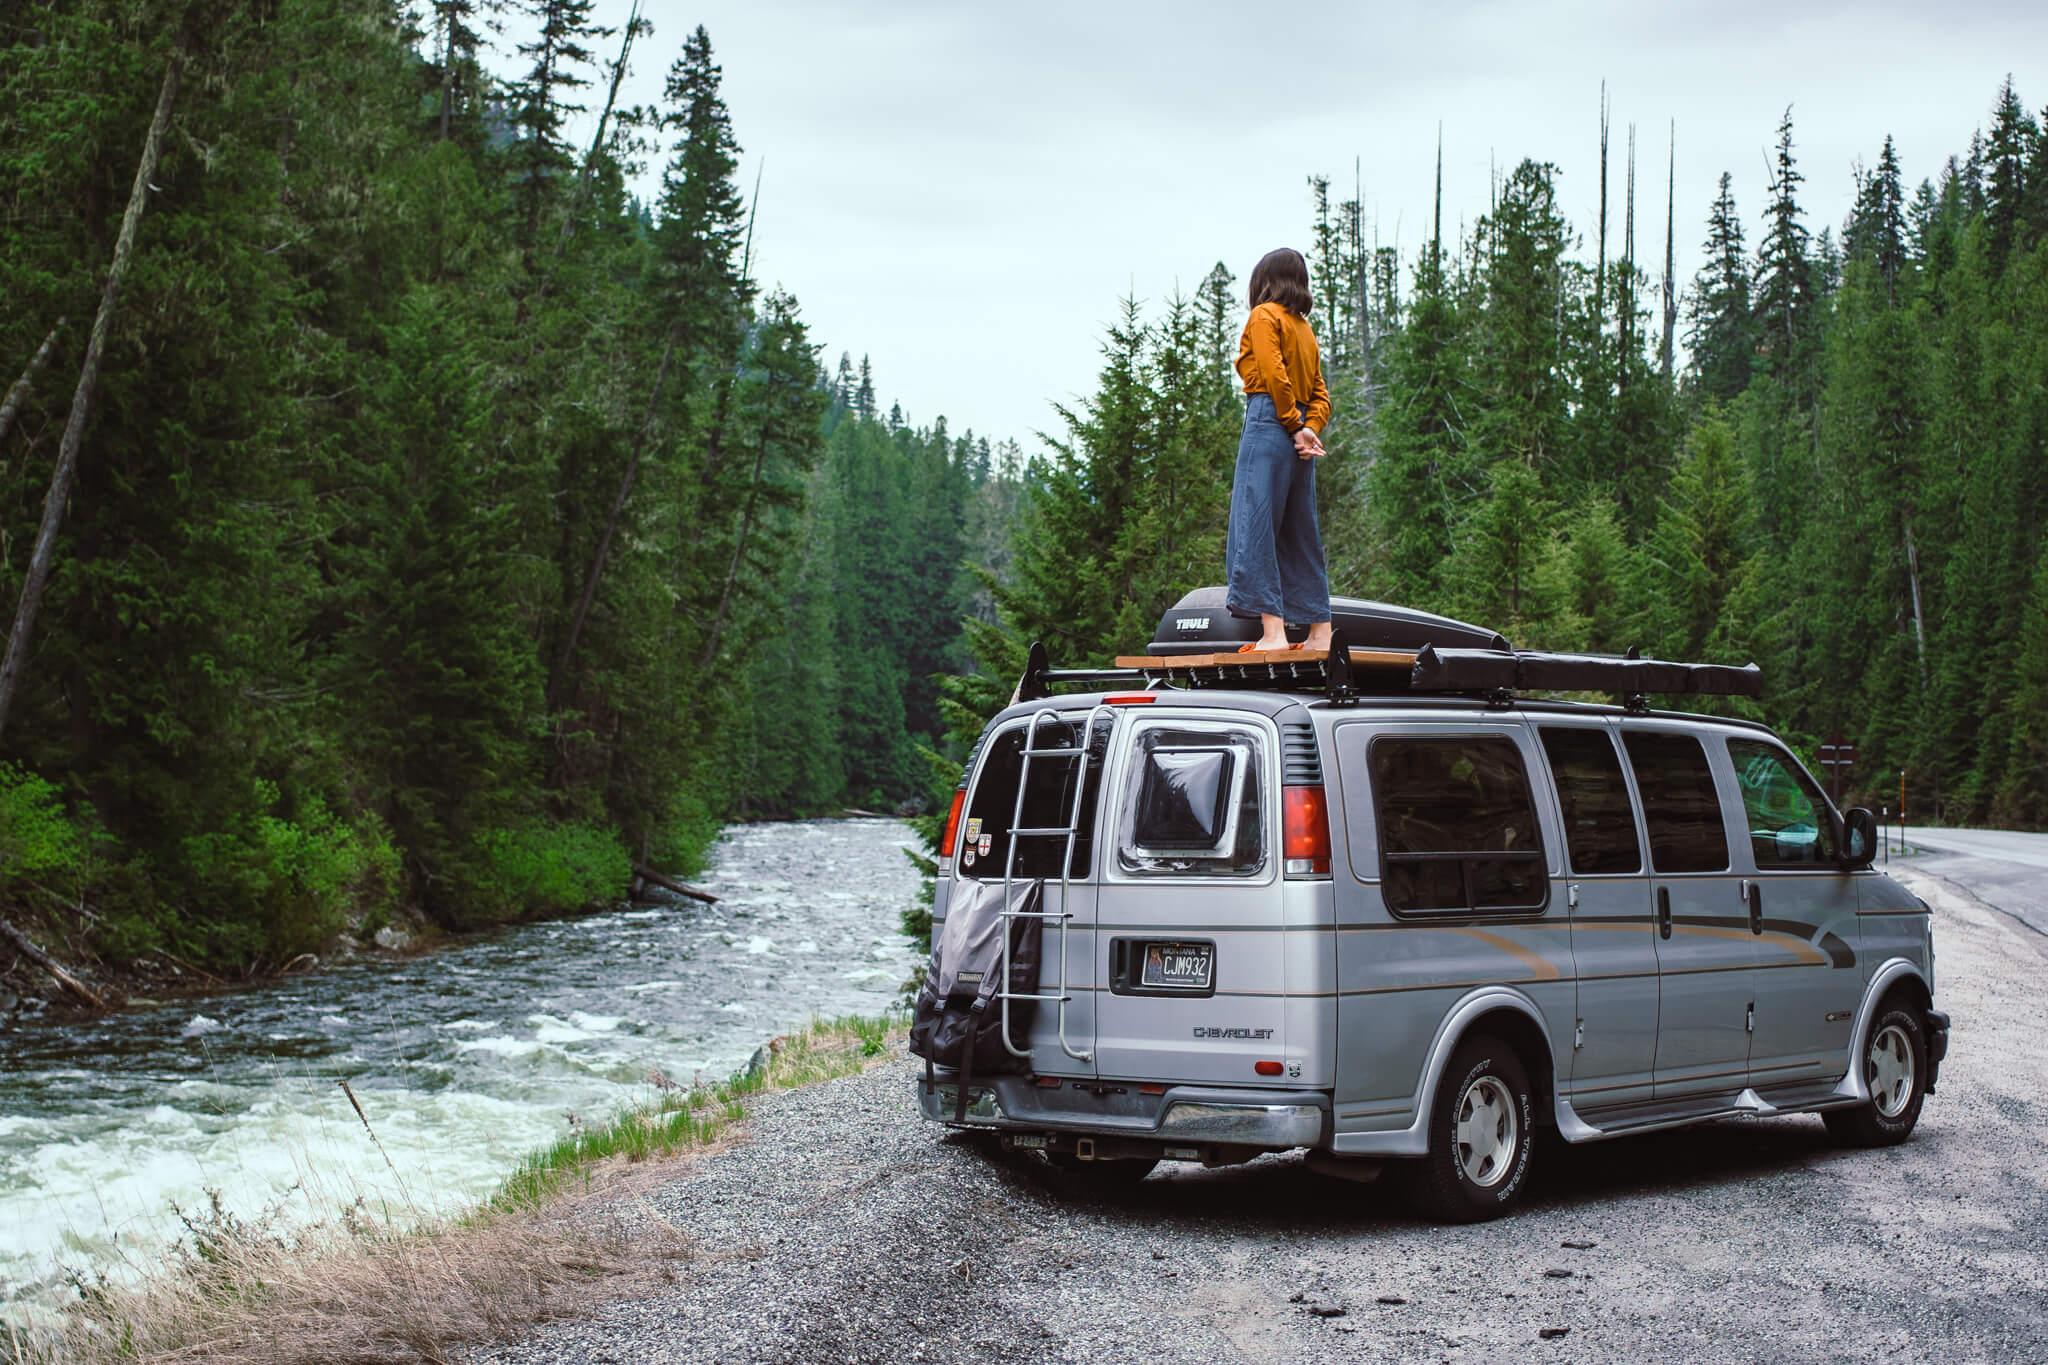 1997+Chevy+Express+Camper+Van+Geneva+Conversion+Lochsa+River+Idaho.jpg